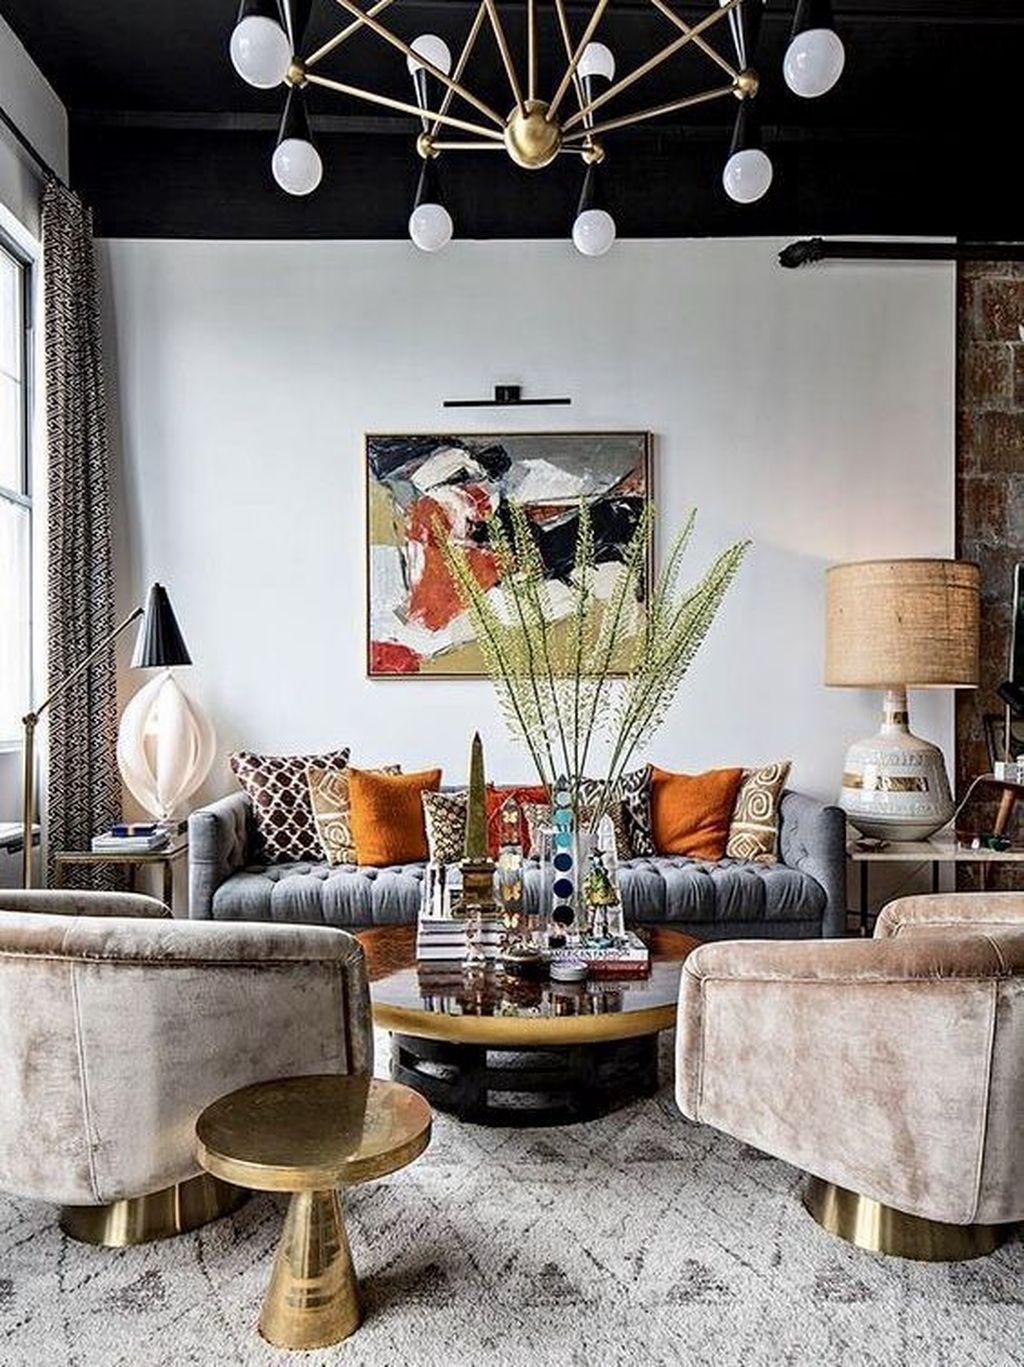 Inspiring Modern Home Furnishings Design Ideas 35